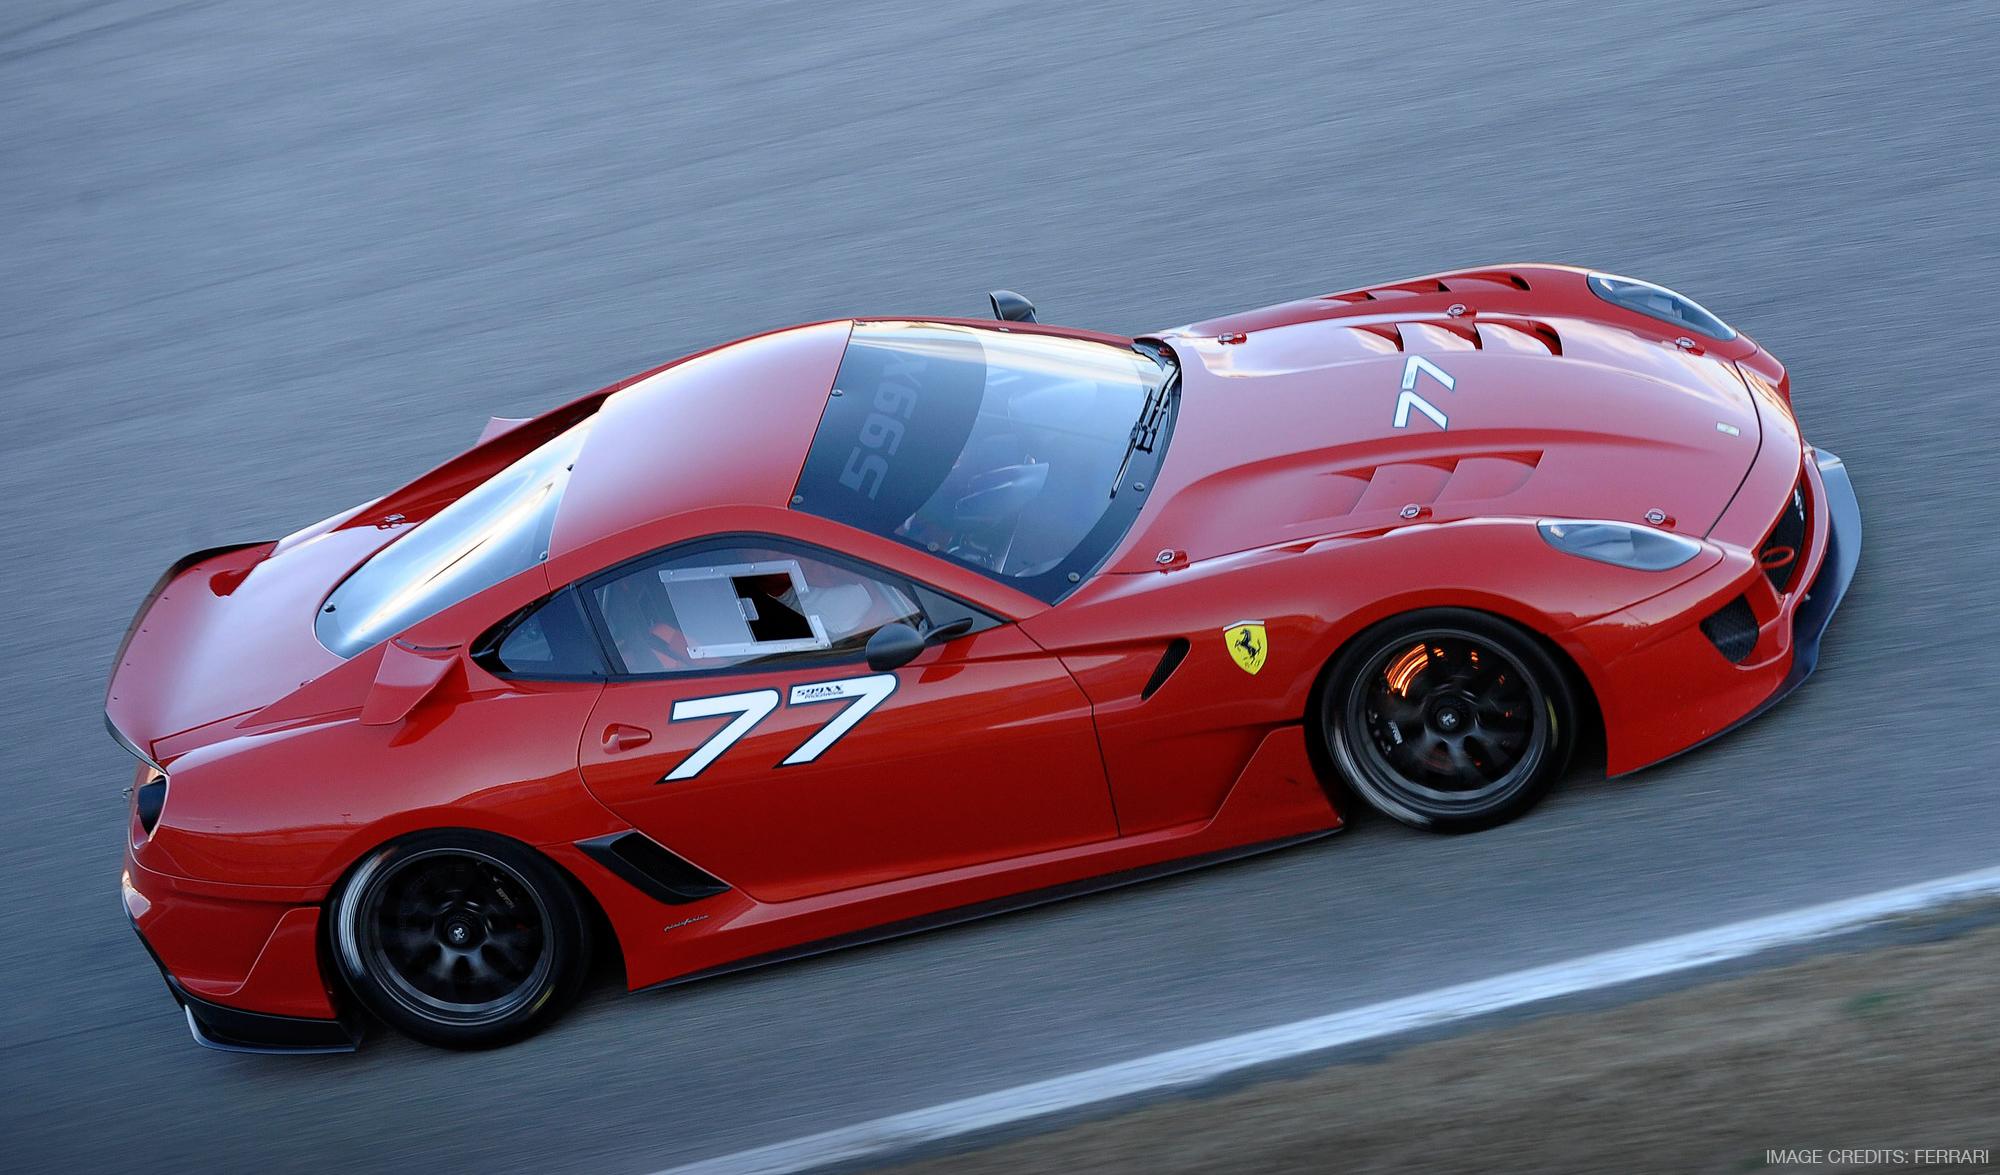 Ferrari 599XX Exterior Design by Miroslav Dimitrov | Image Credits: Ferrari